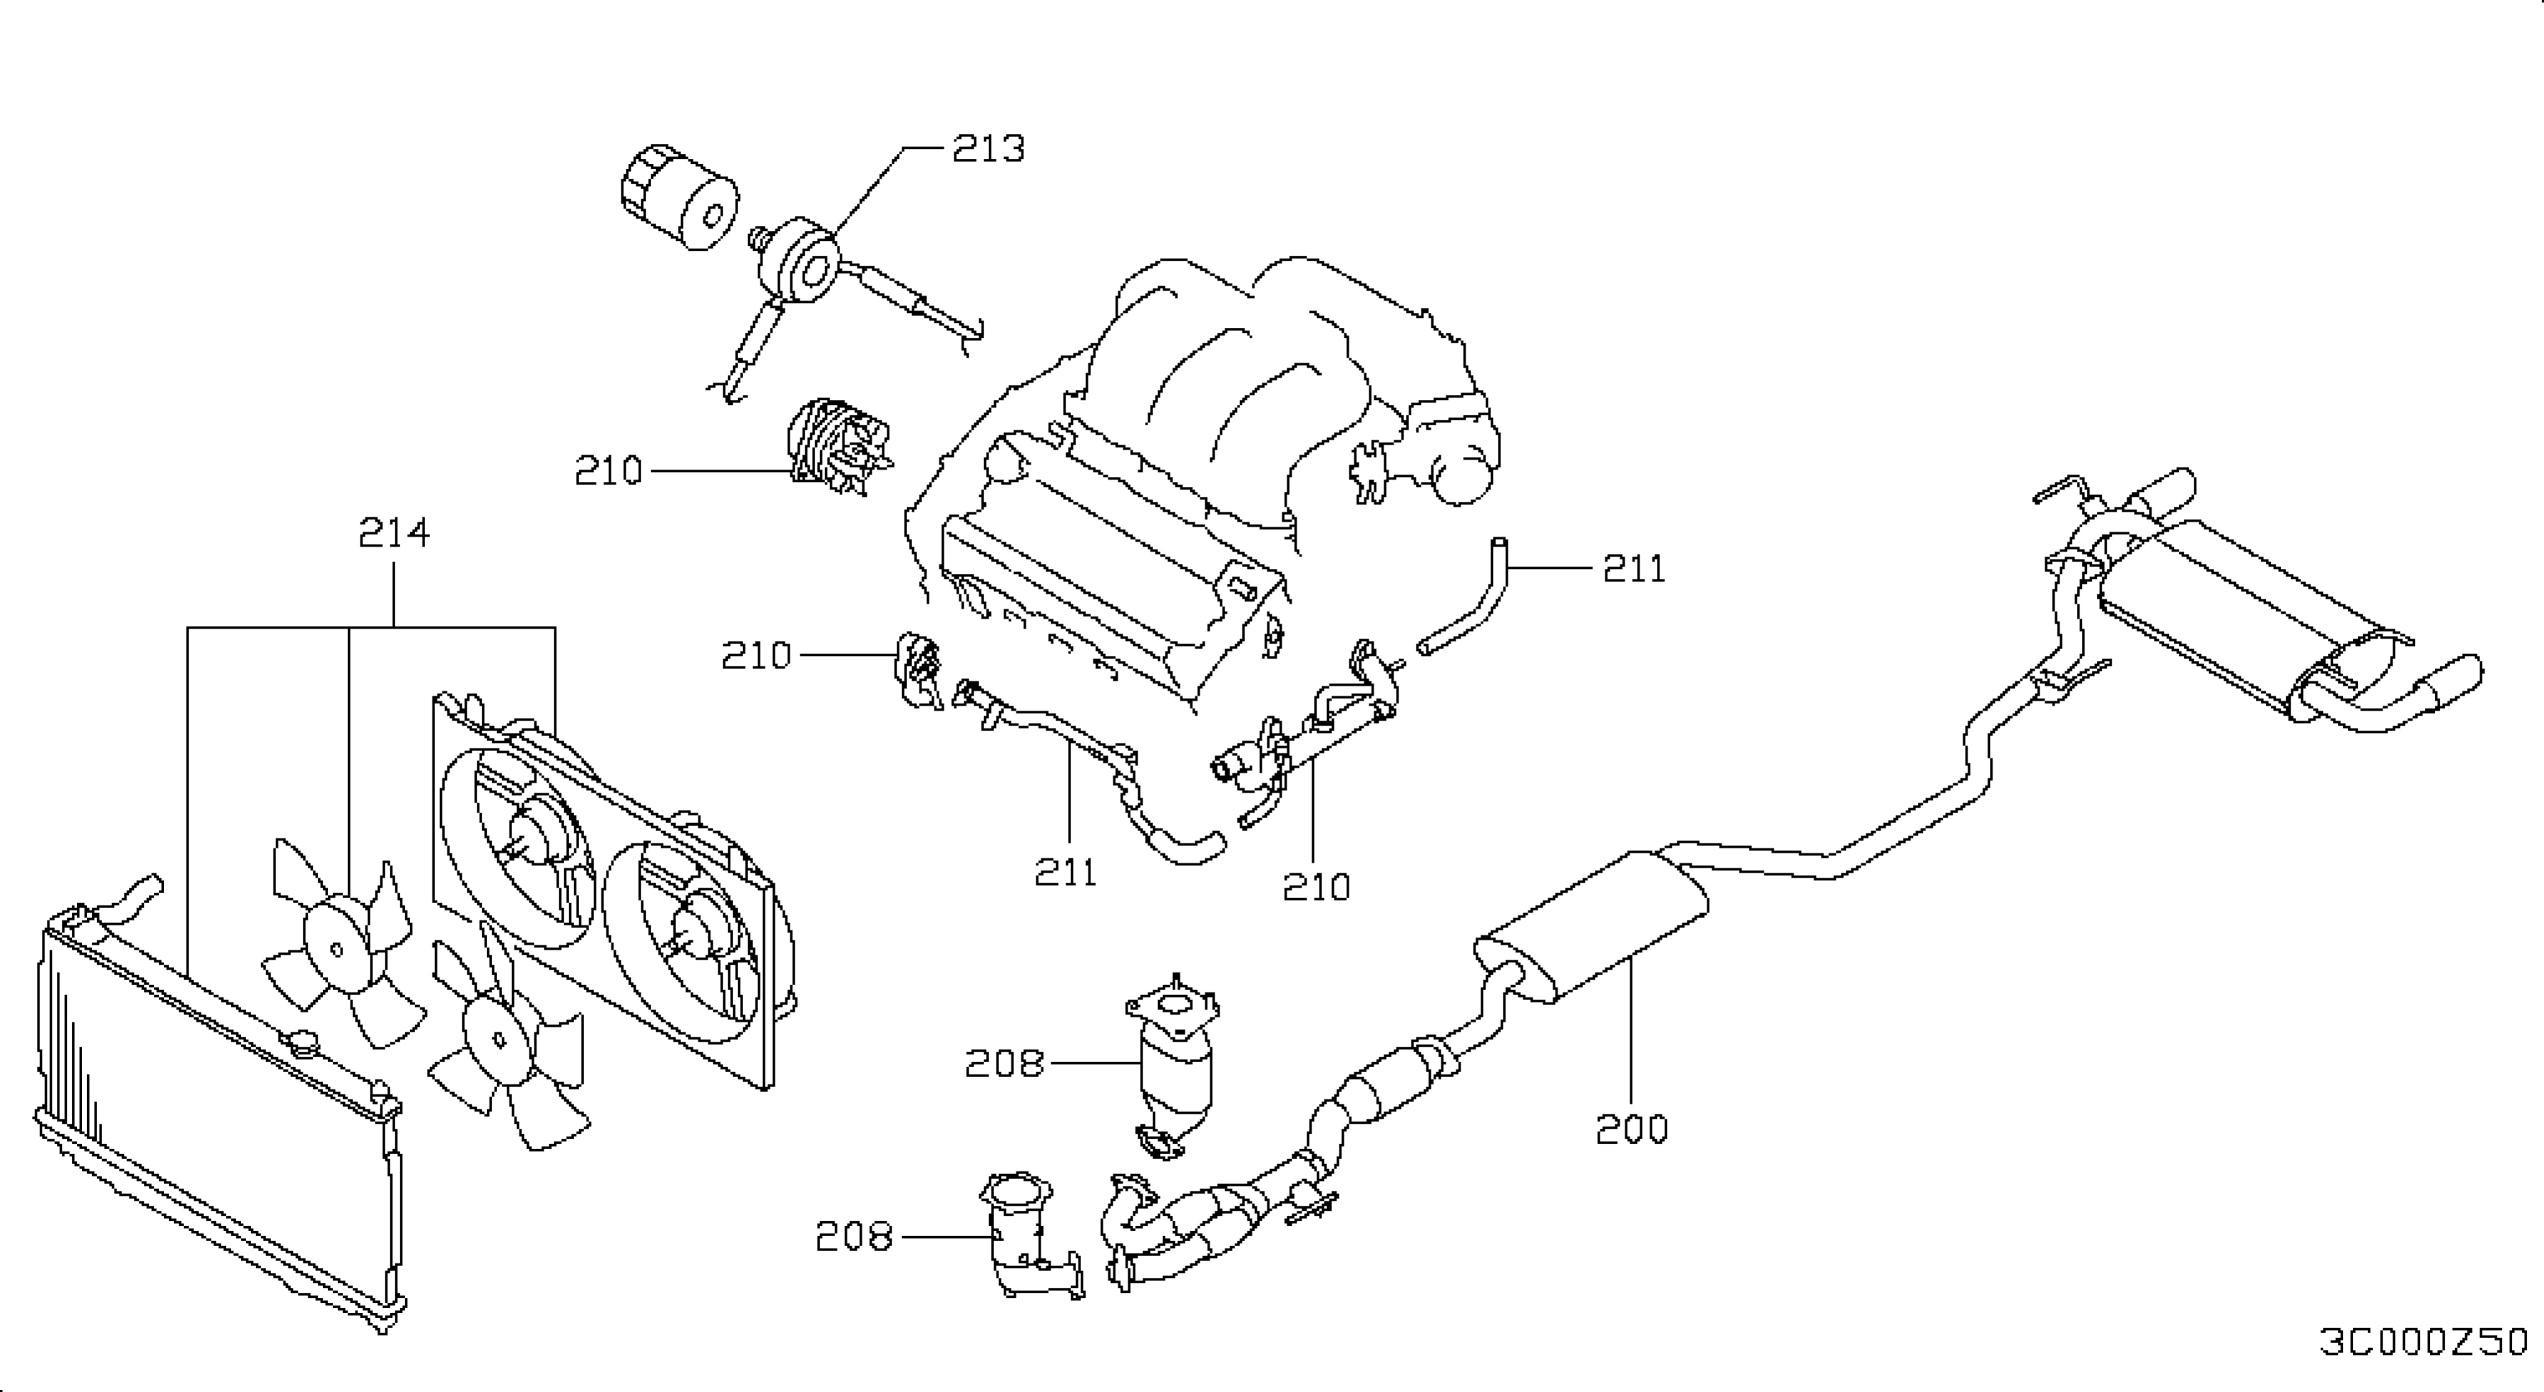 2002 Nissan Altima Engine Diagram 2004 Nissan Murano Oem Parts Nissan Usa  Estore